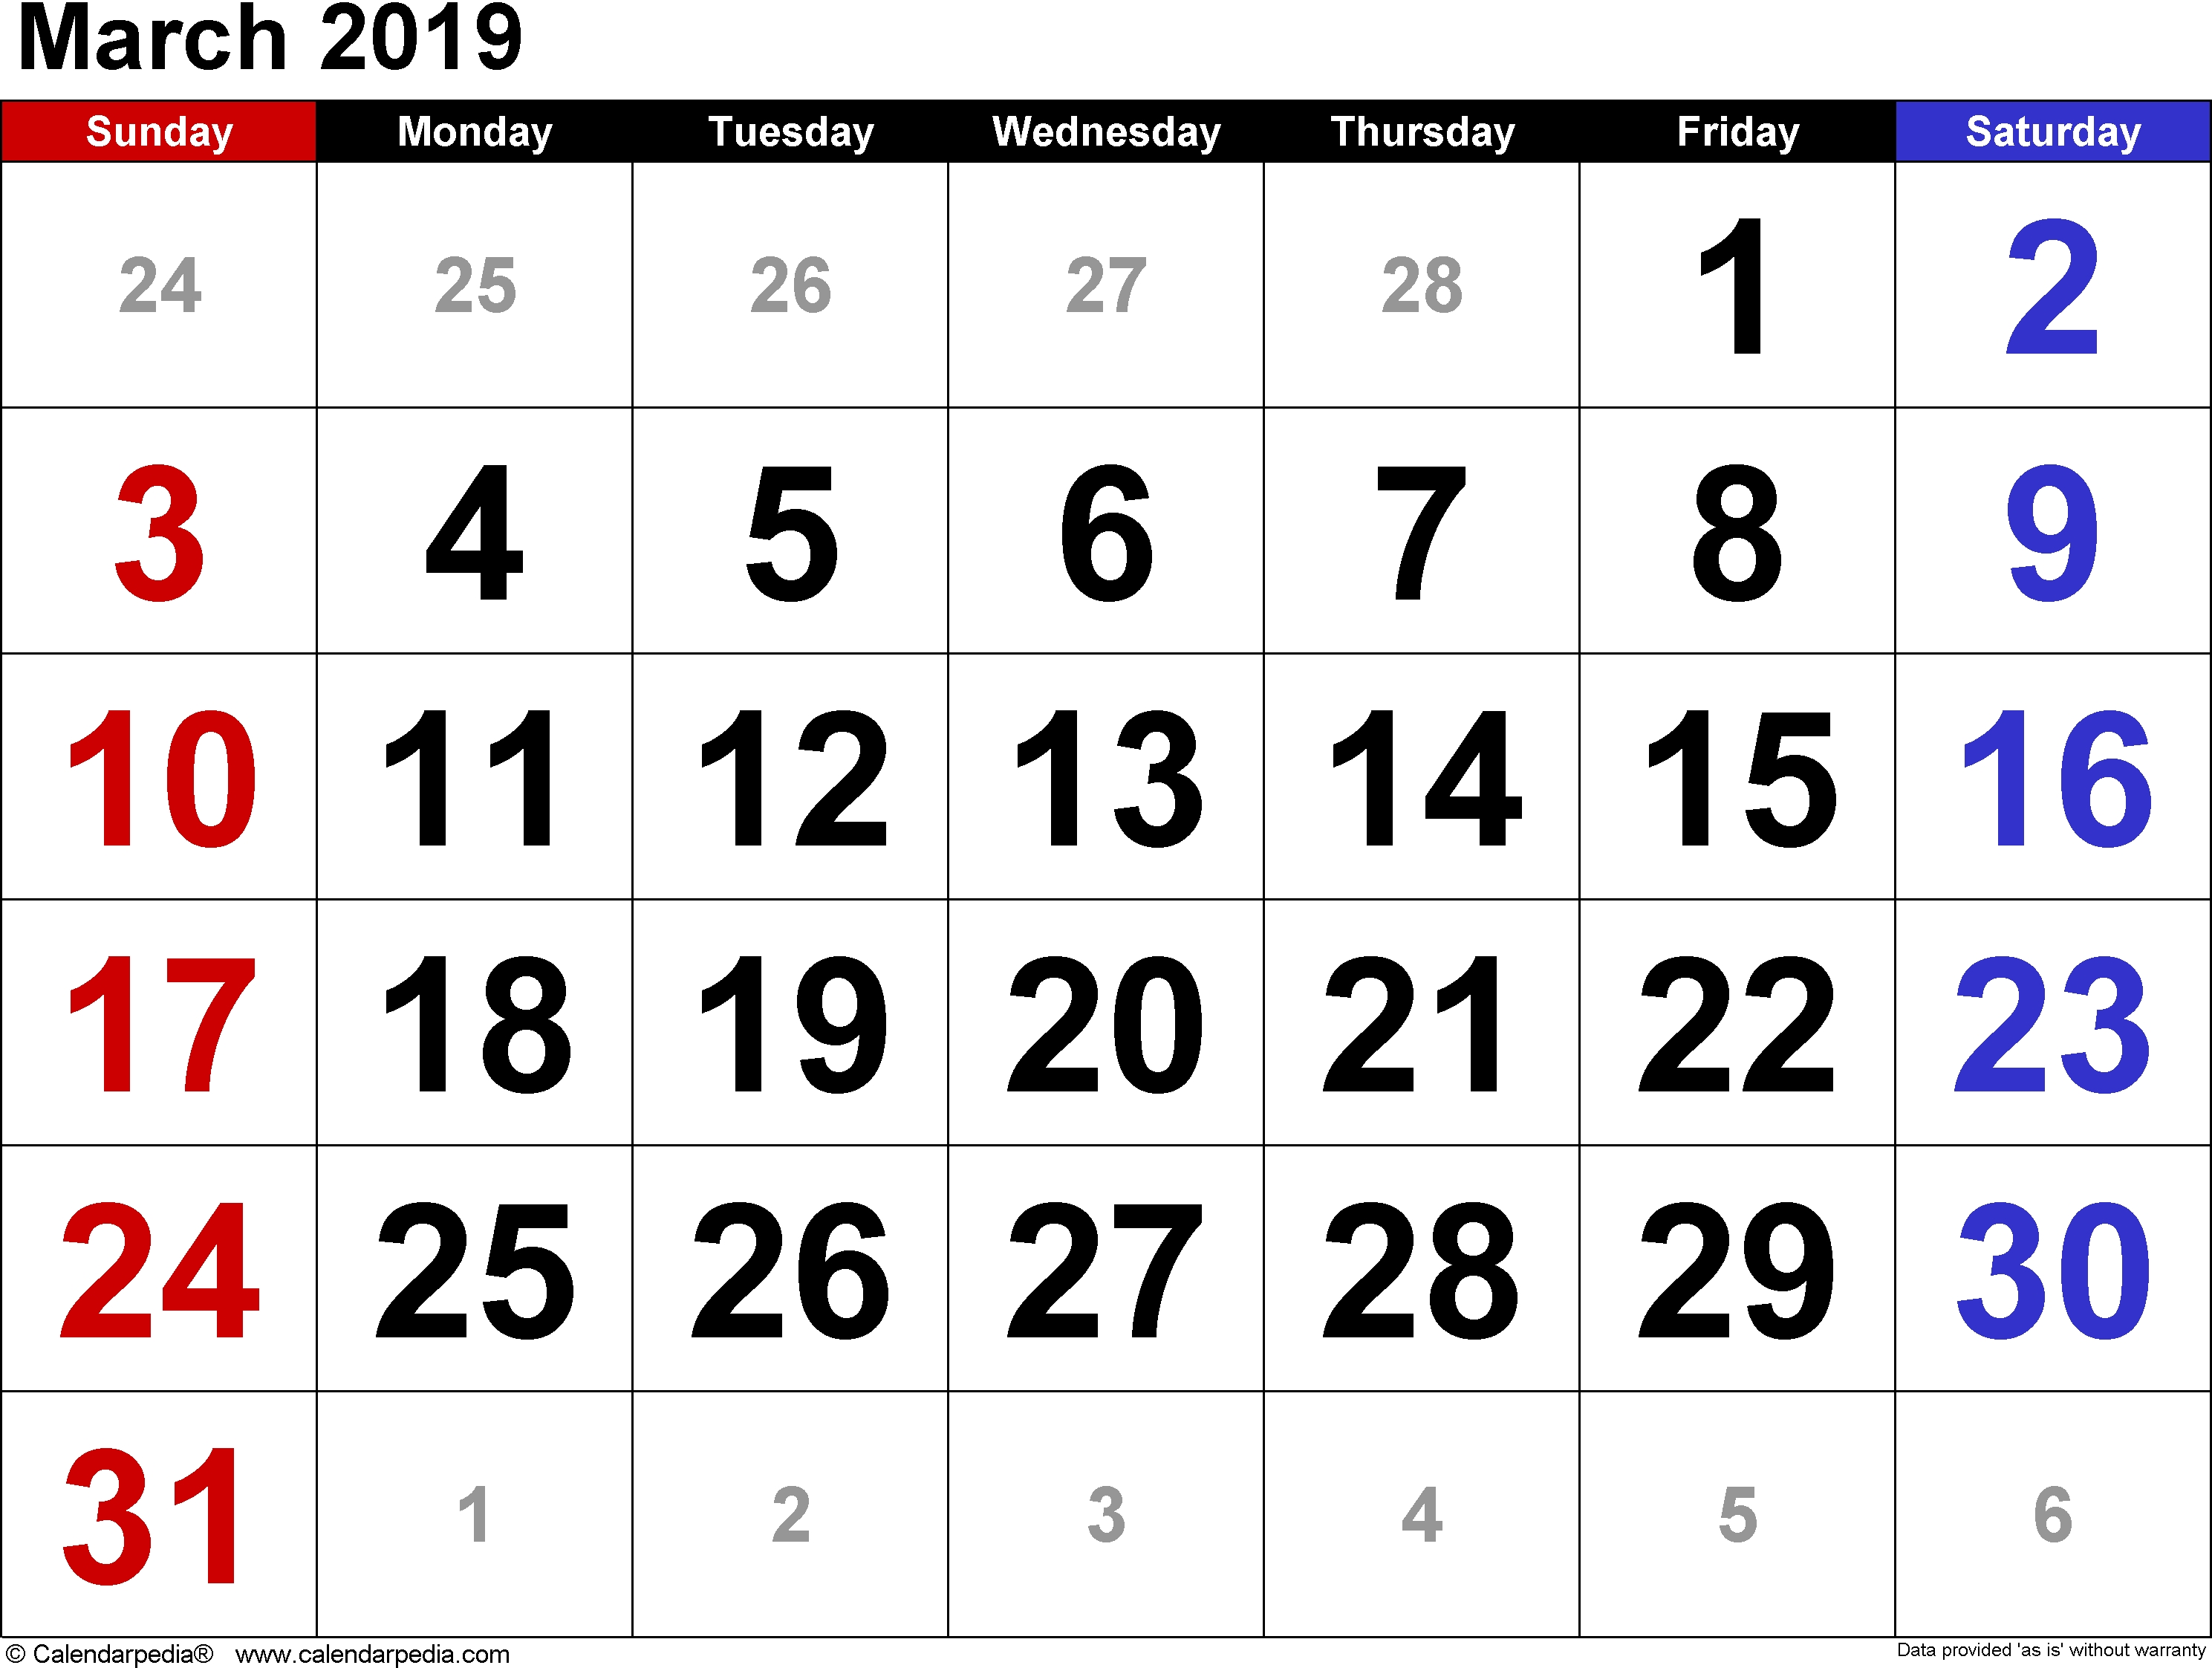 Get Free Template March 2019 A4 Calendar - Free Calendar And Holidays March 2 2019 Calendar